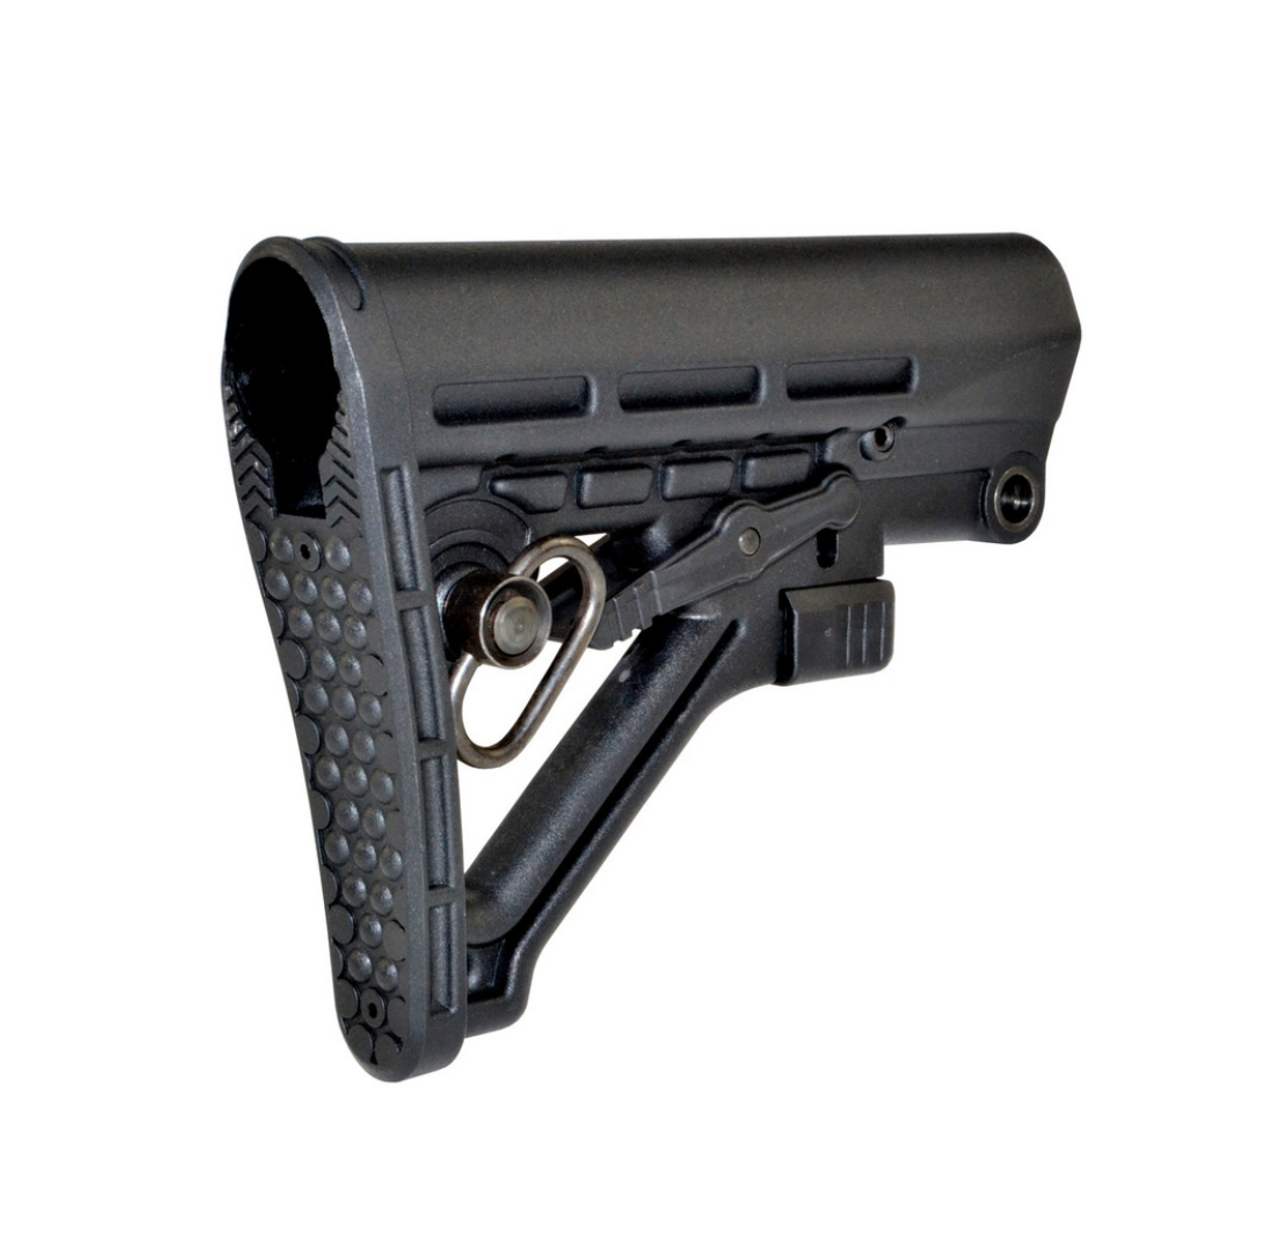 Mil-Spec Adjustable Stock w/ QR Sling Adapter